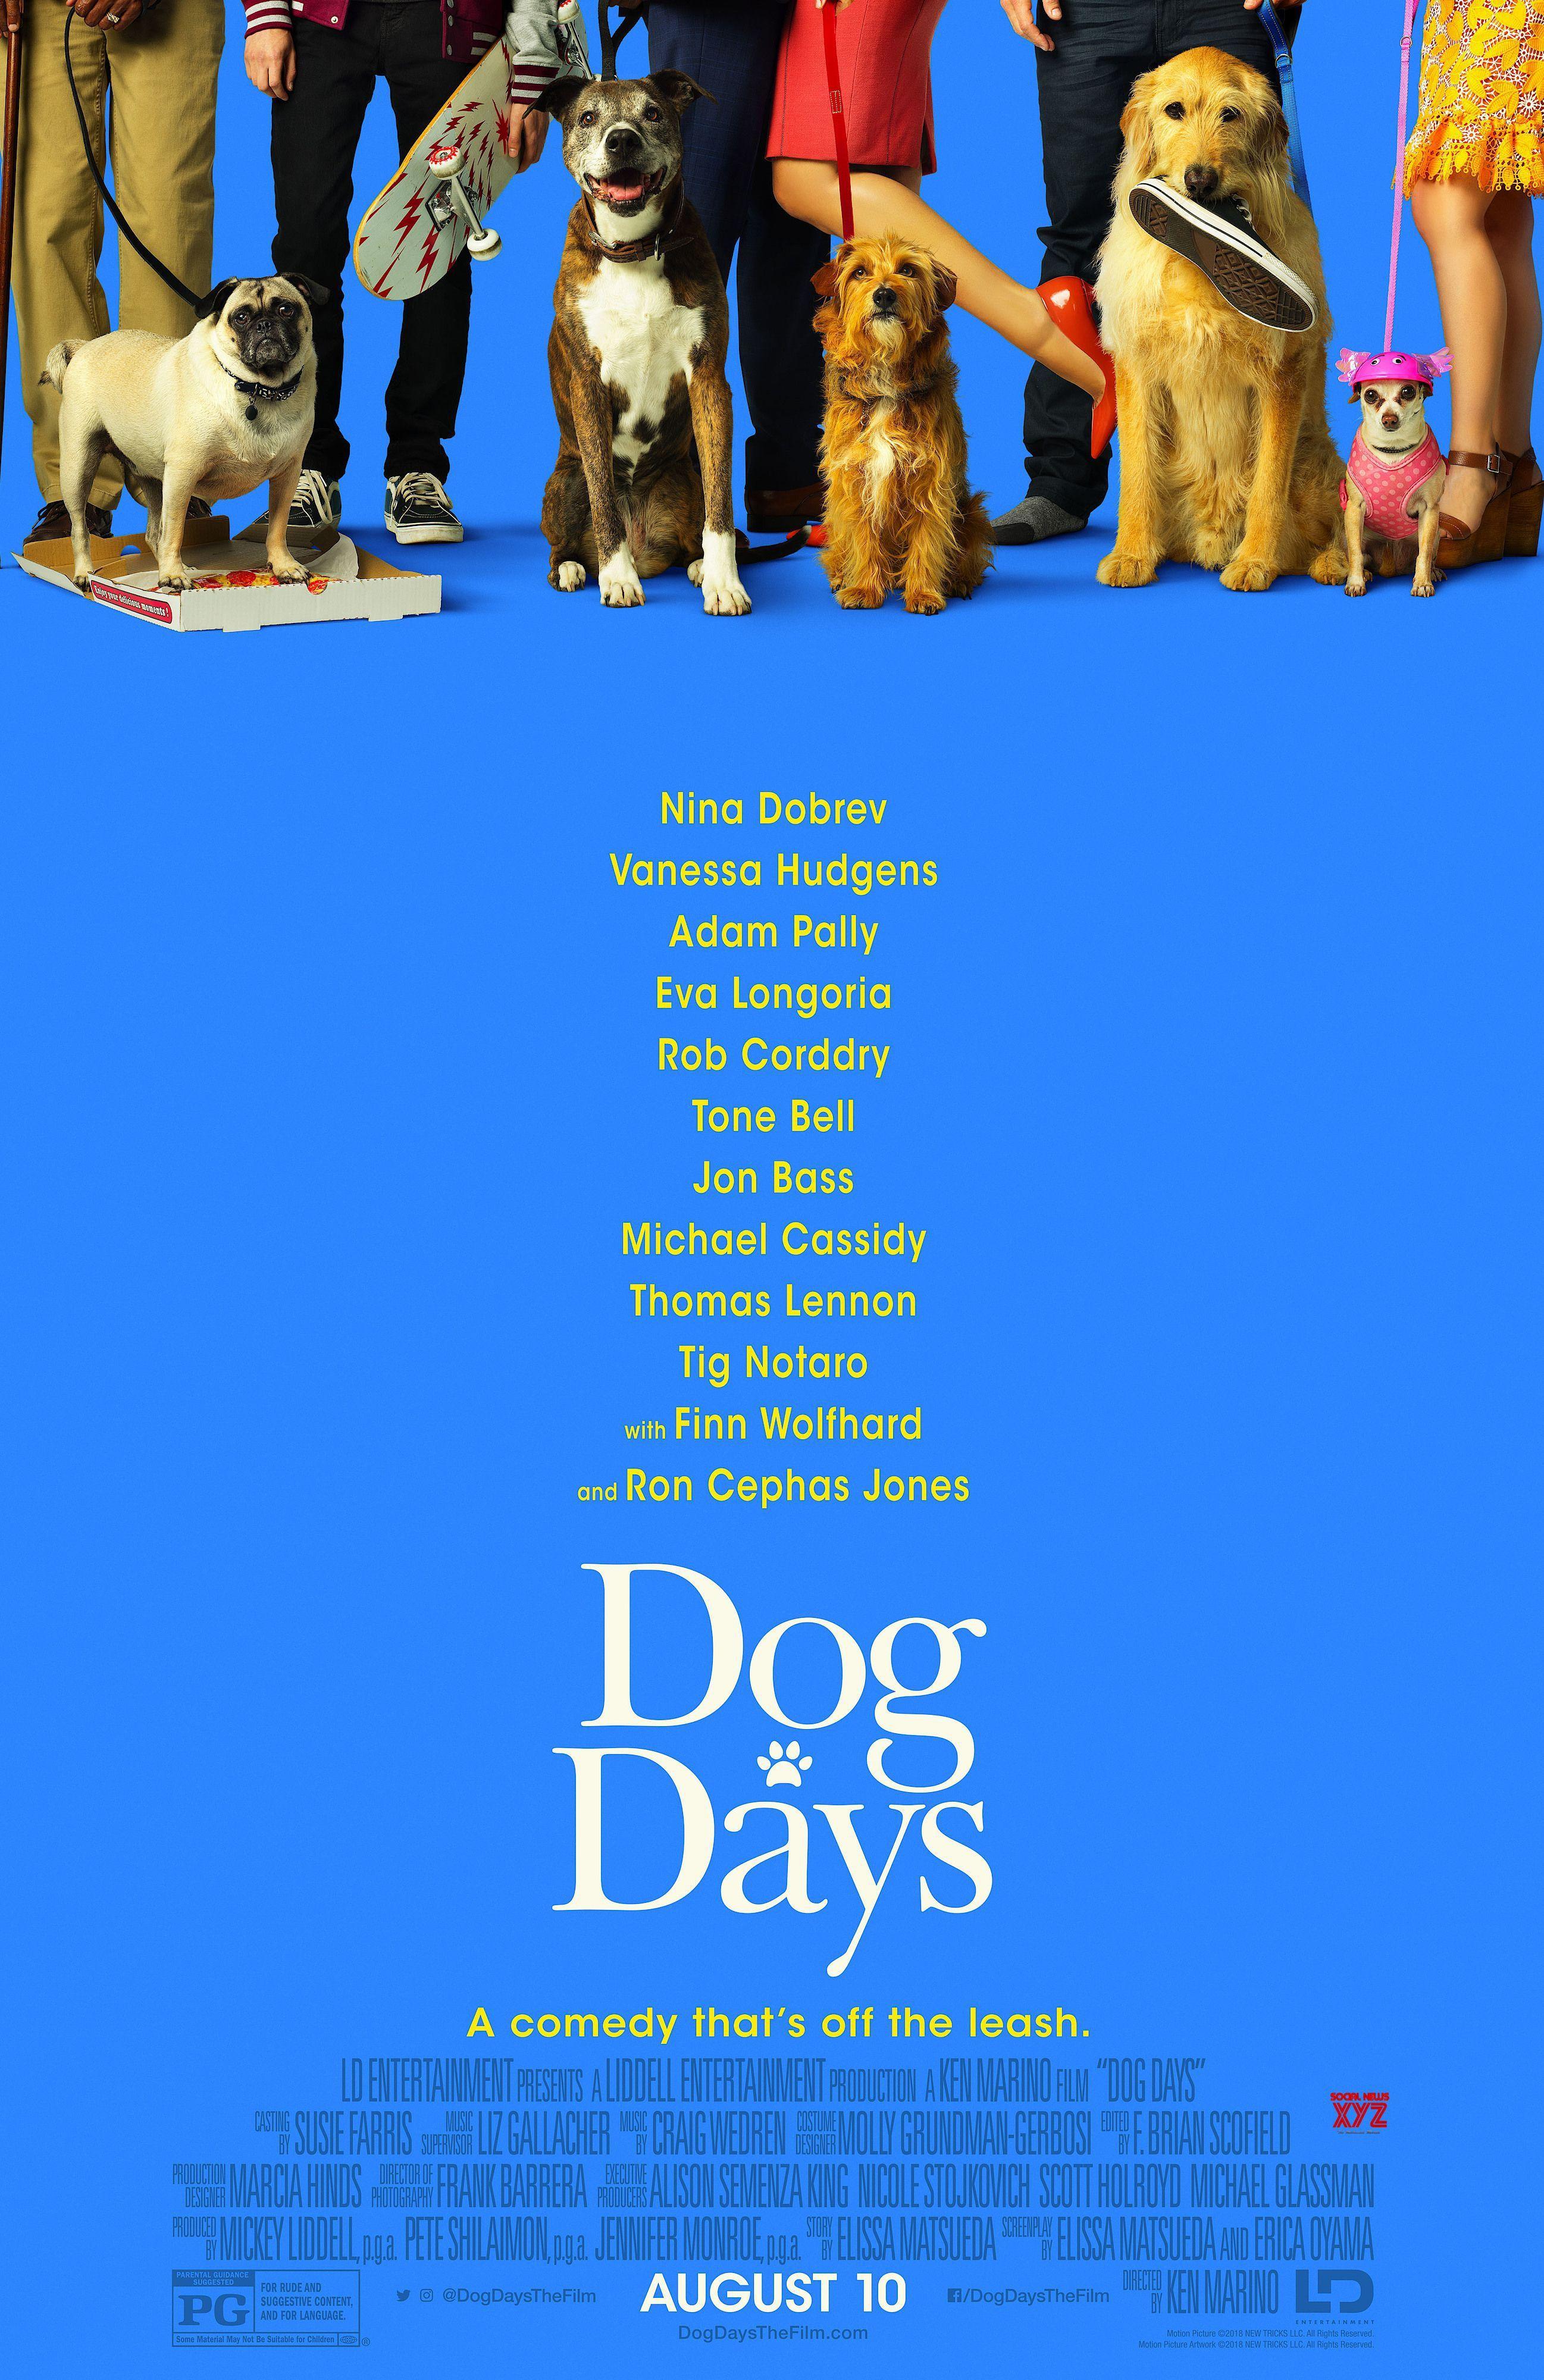 Dog Days (2018) (1080p BluRay x265 HEVC 10bit AAC 5 1 Tigole